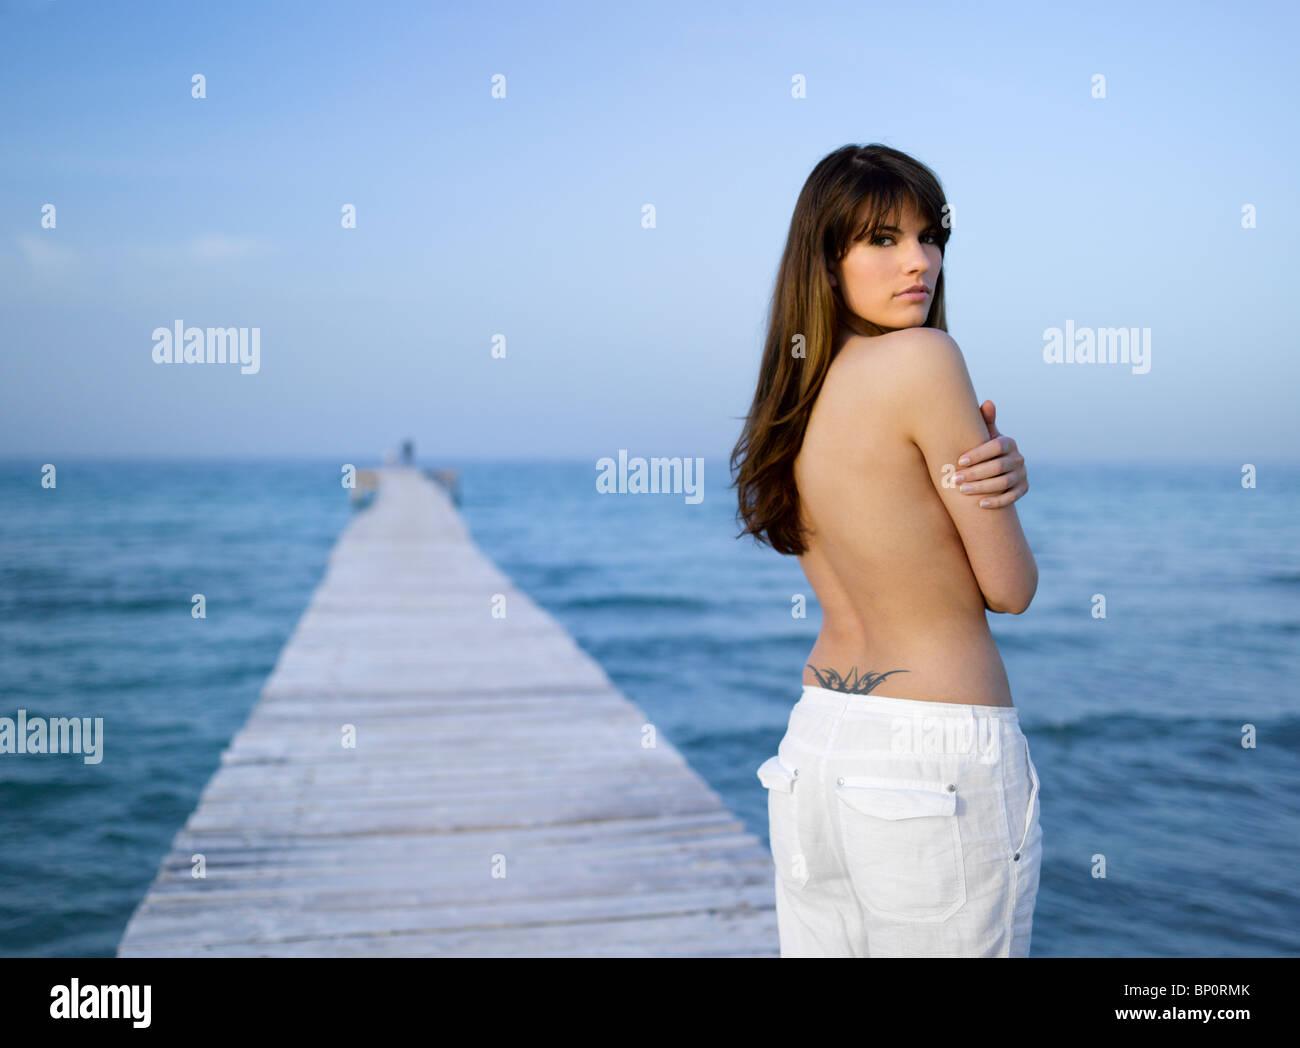 Woman on pontoon - Stock Image